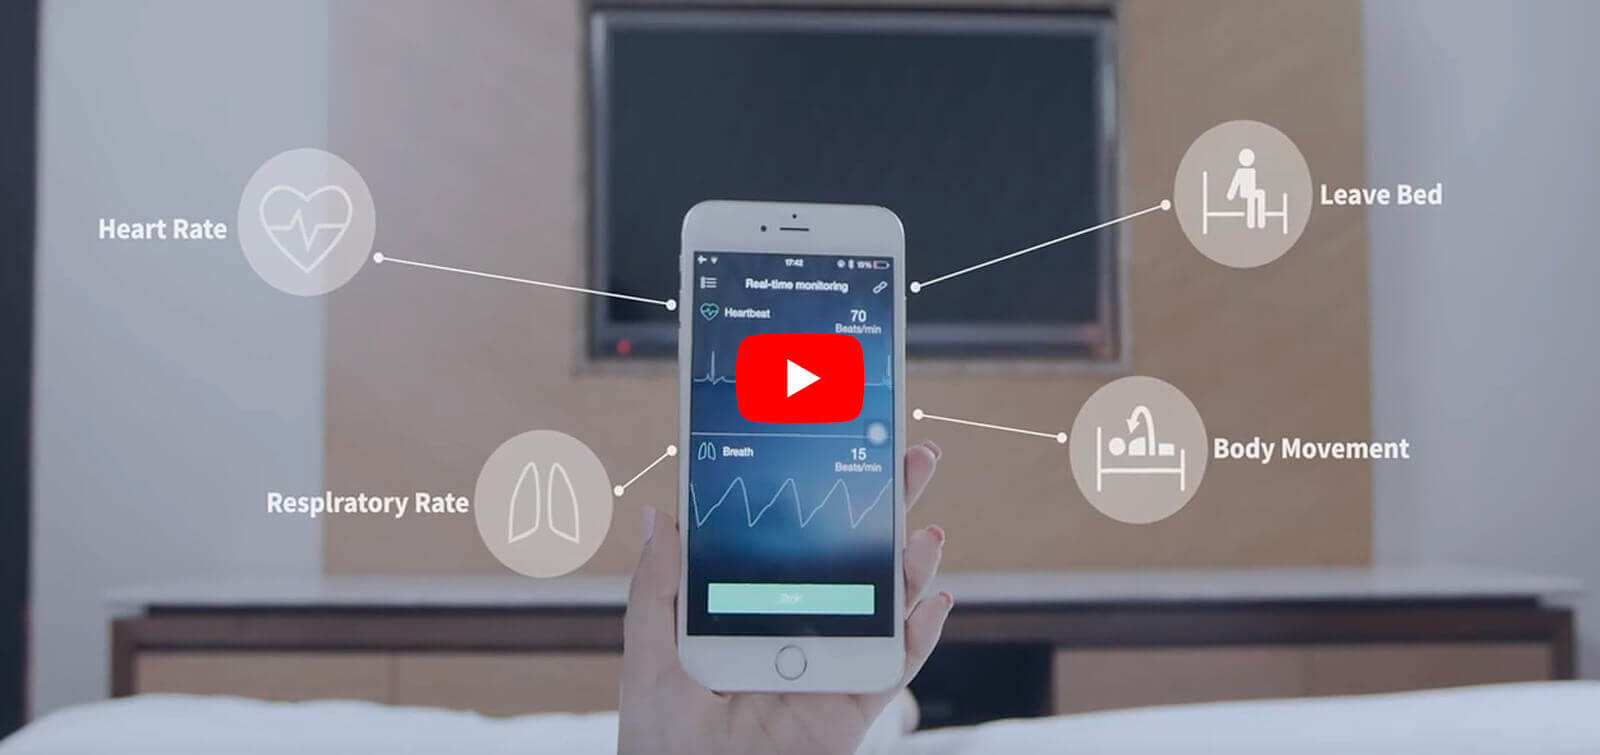 Sensor inteligente Sleepace